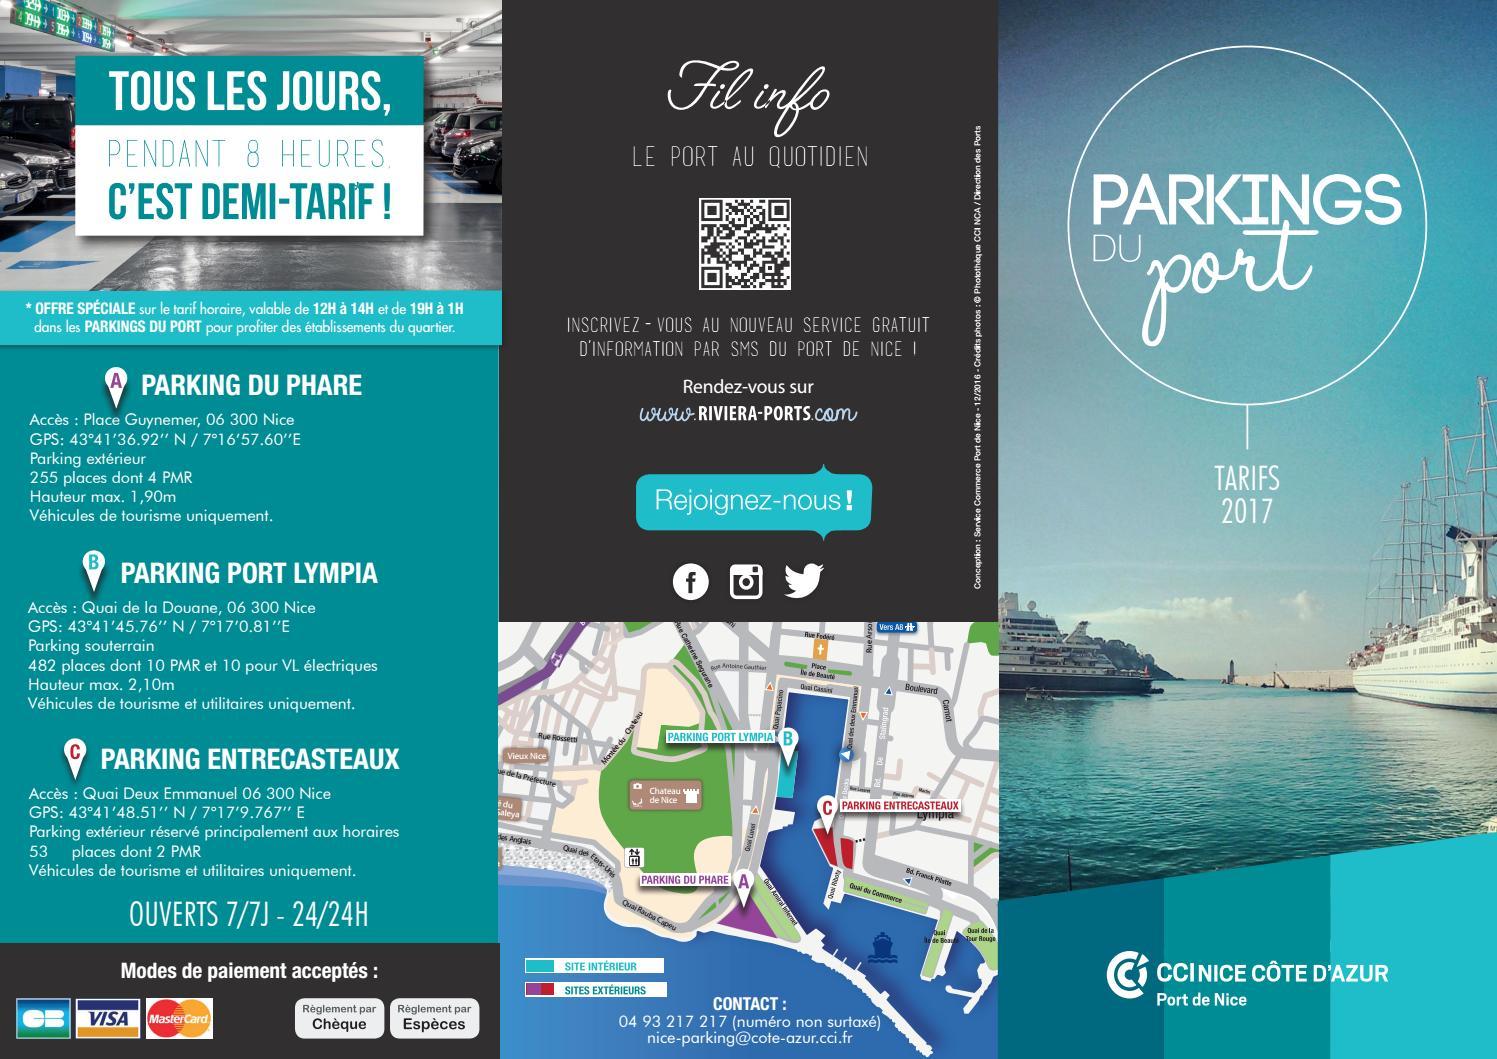 Parkings du port de nice tarifs 2017 by cci nice c te d - Parking port nice ...